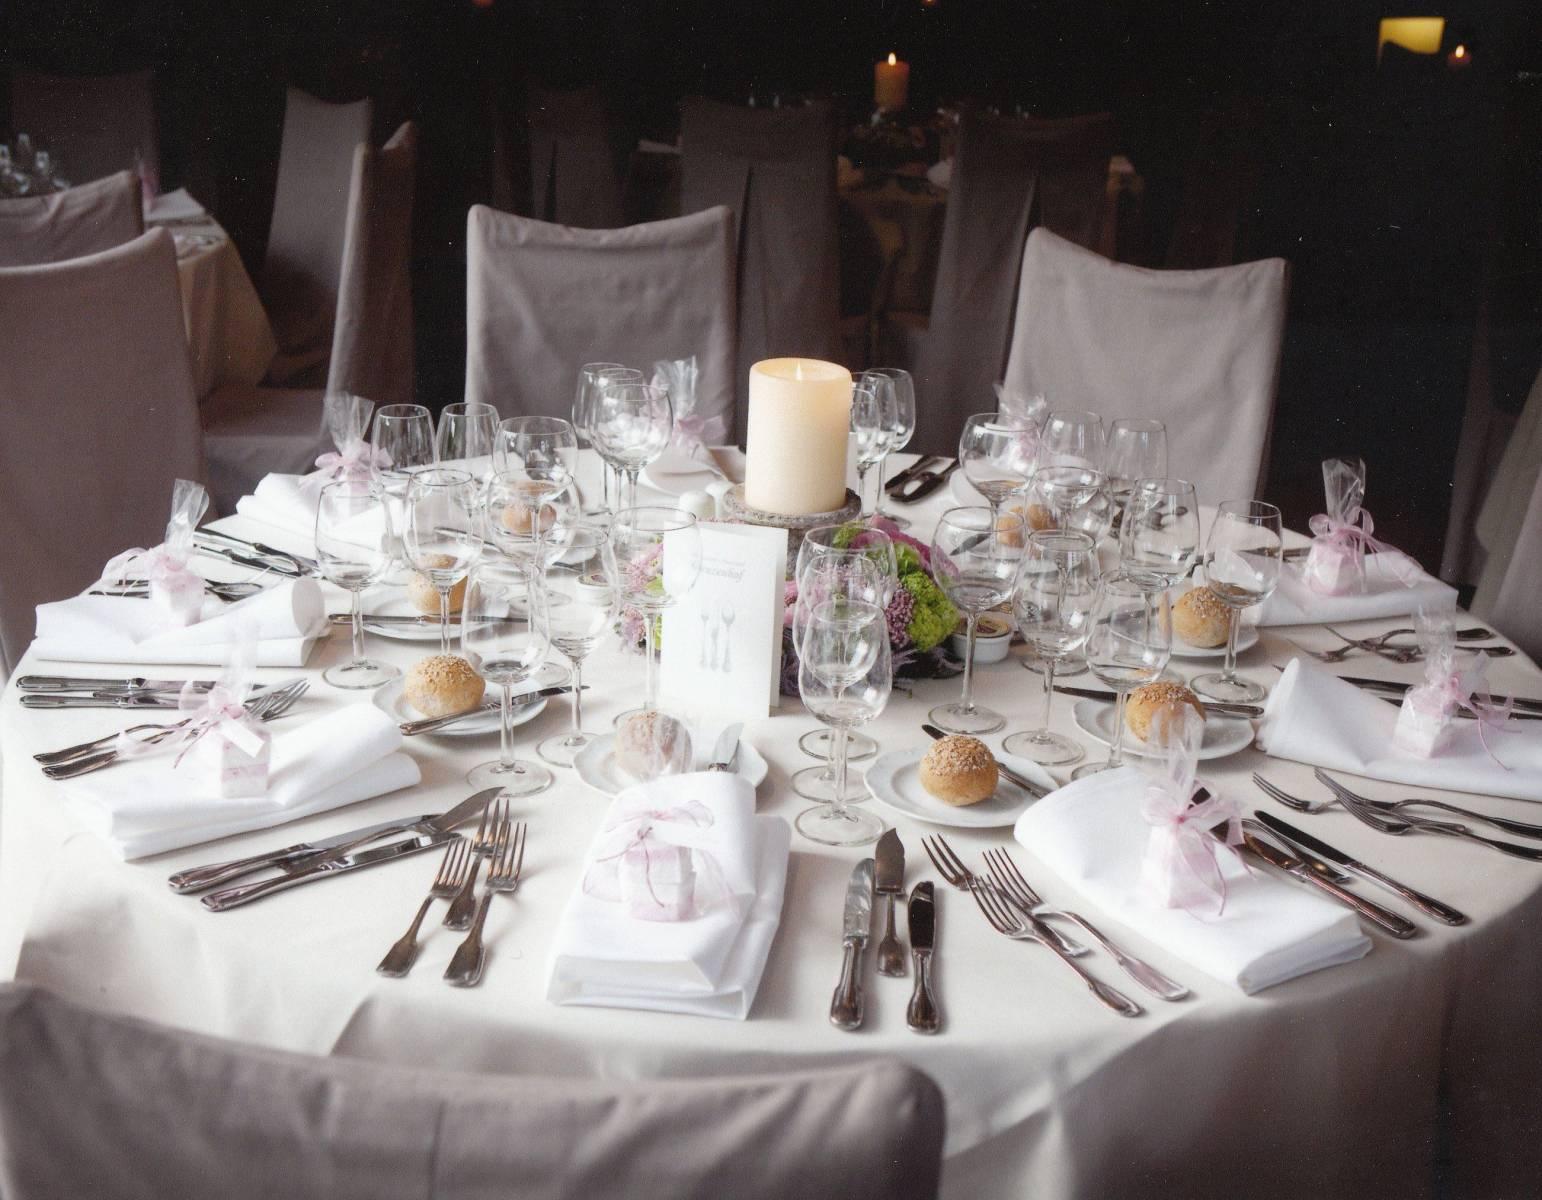 Geuzenhof - Feestzaal - House of Weddings - 3 (1)